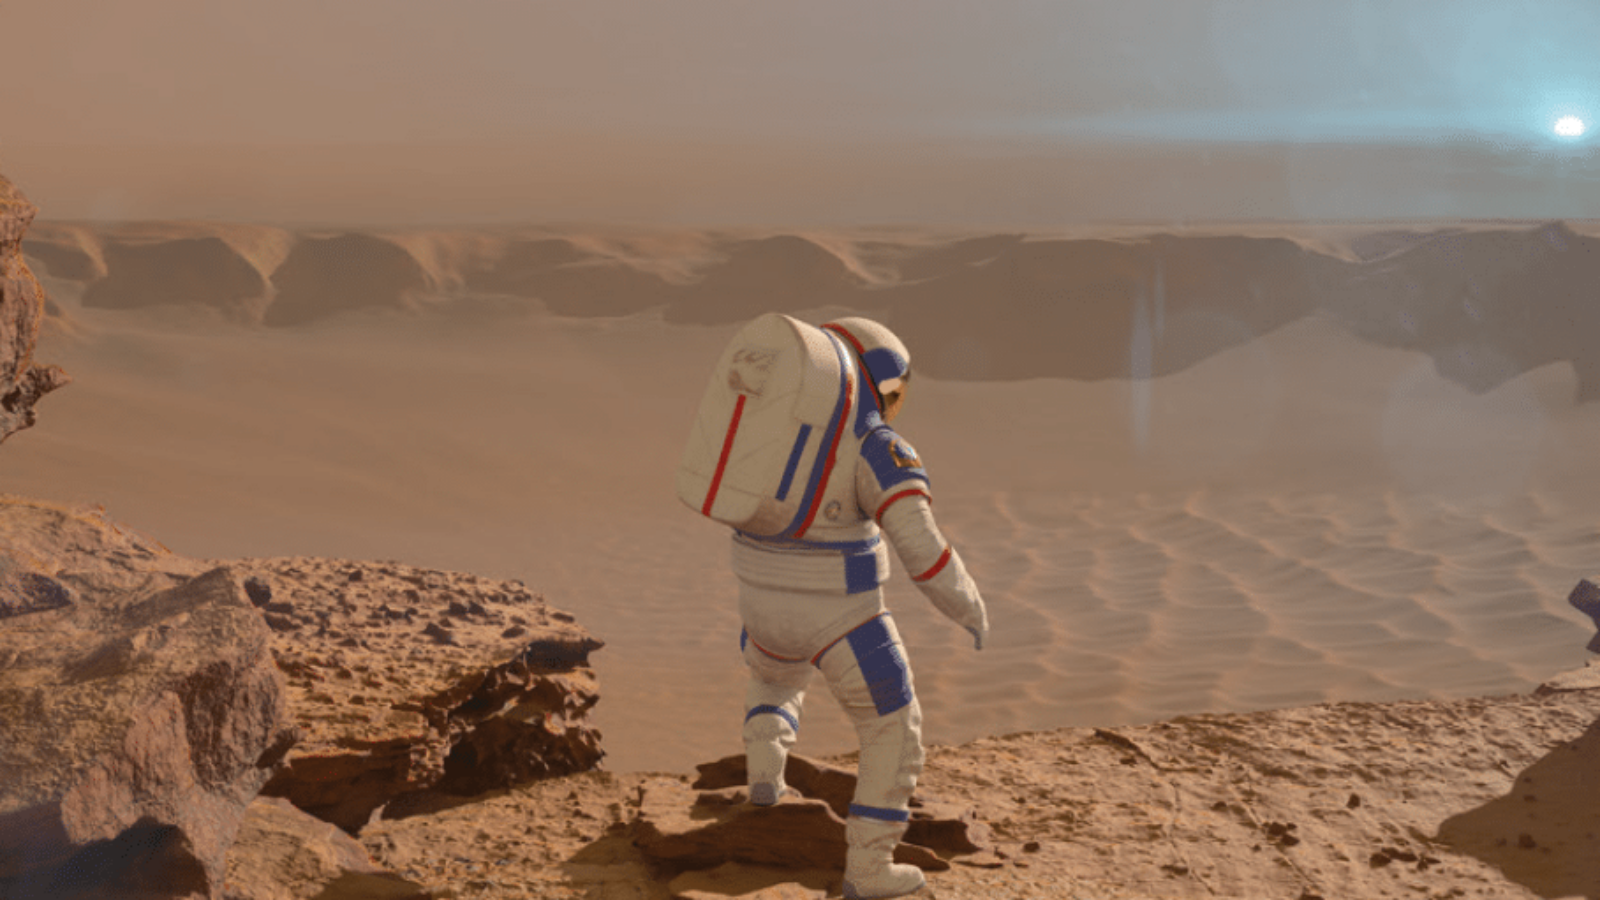 Mars 1001, bis 31.08., Planetarium Hamburg